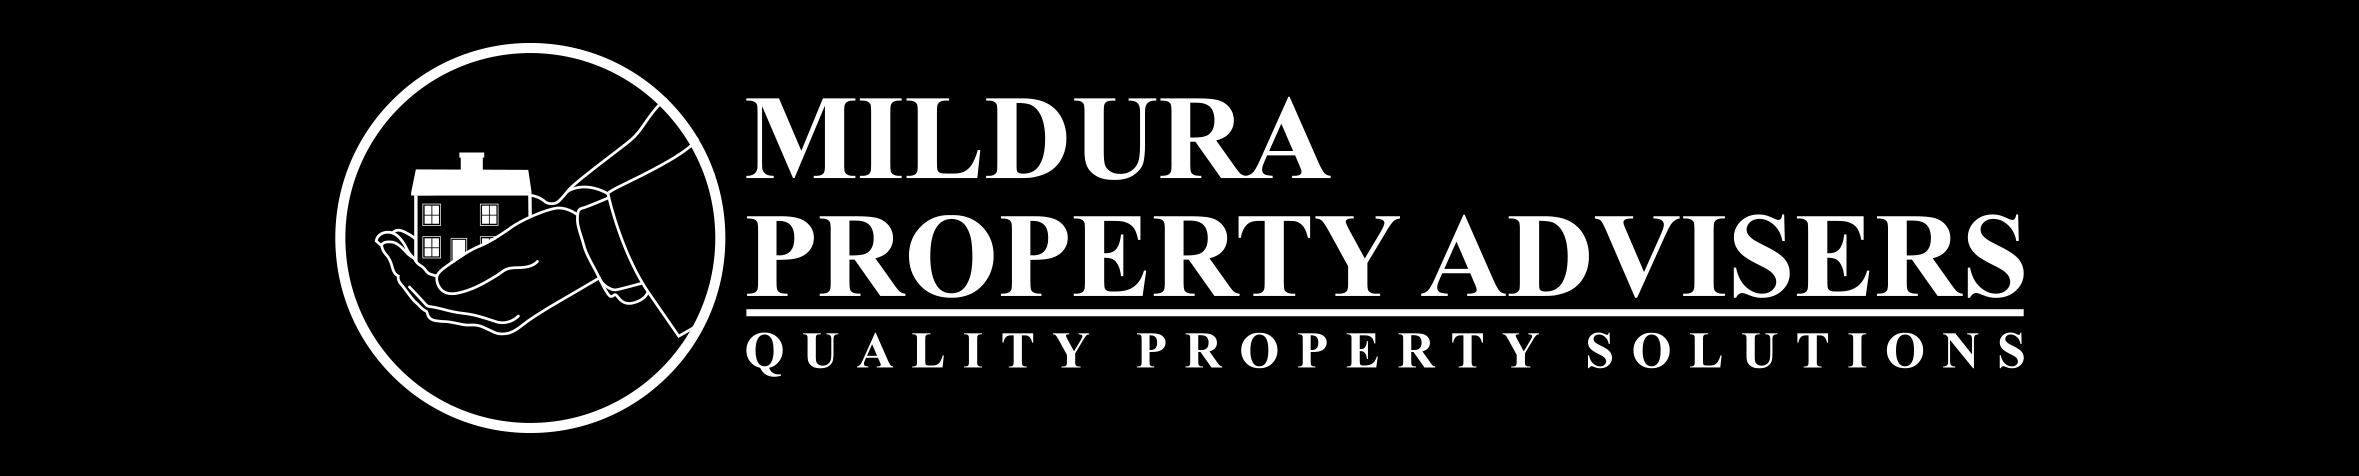 Mildura Property Advisers